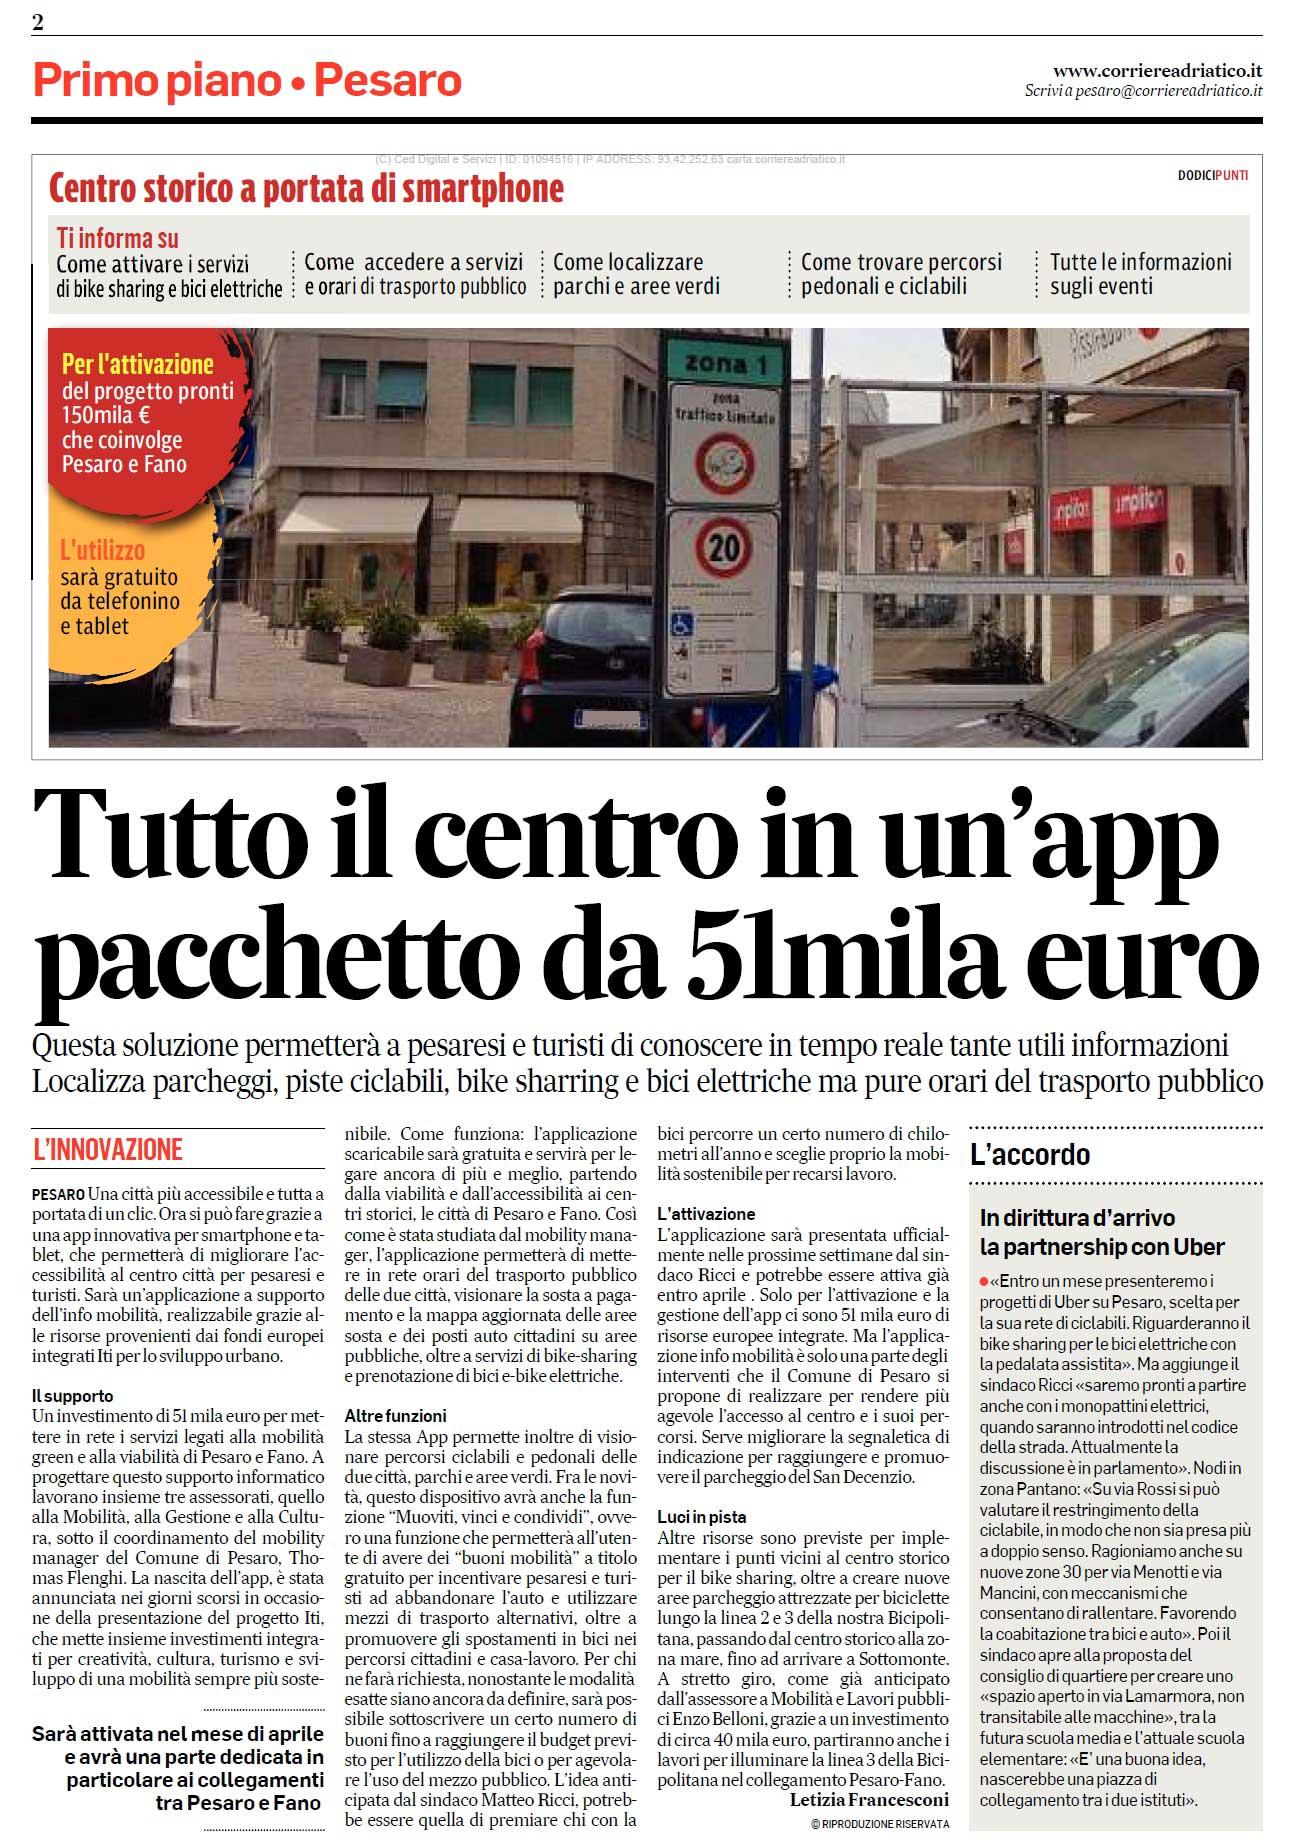 20190318-Corriere-Adriatico-18-Marzo-2019-App-Centro-Storico-Pesaro.jpg